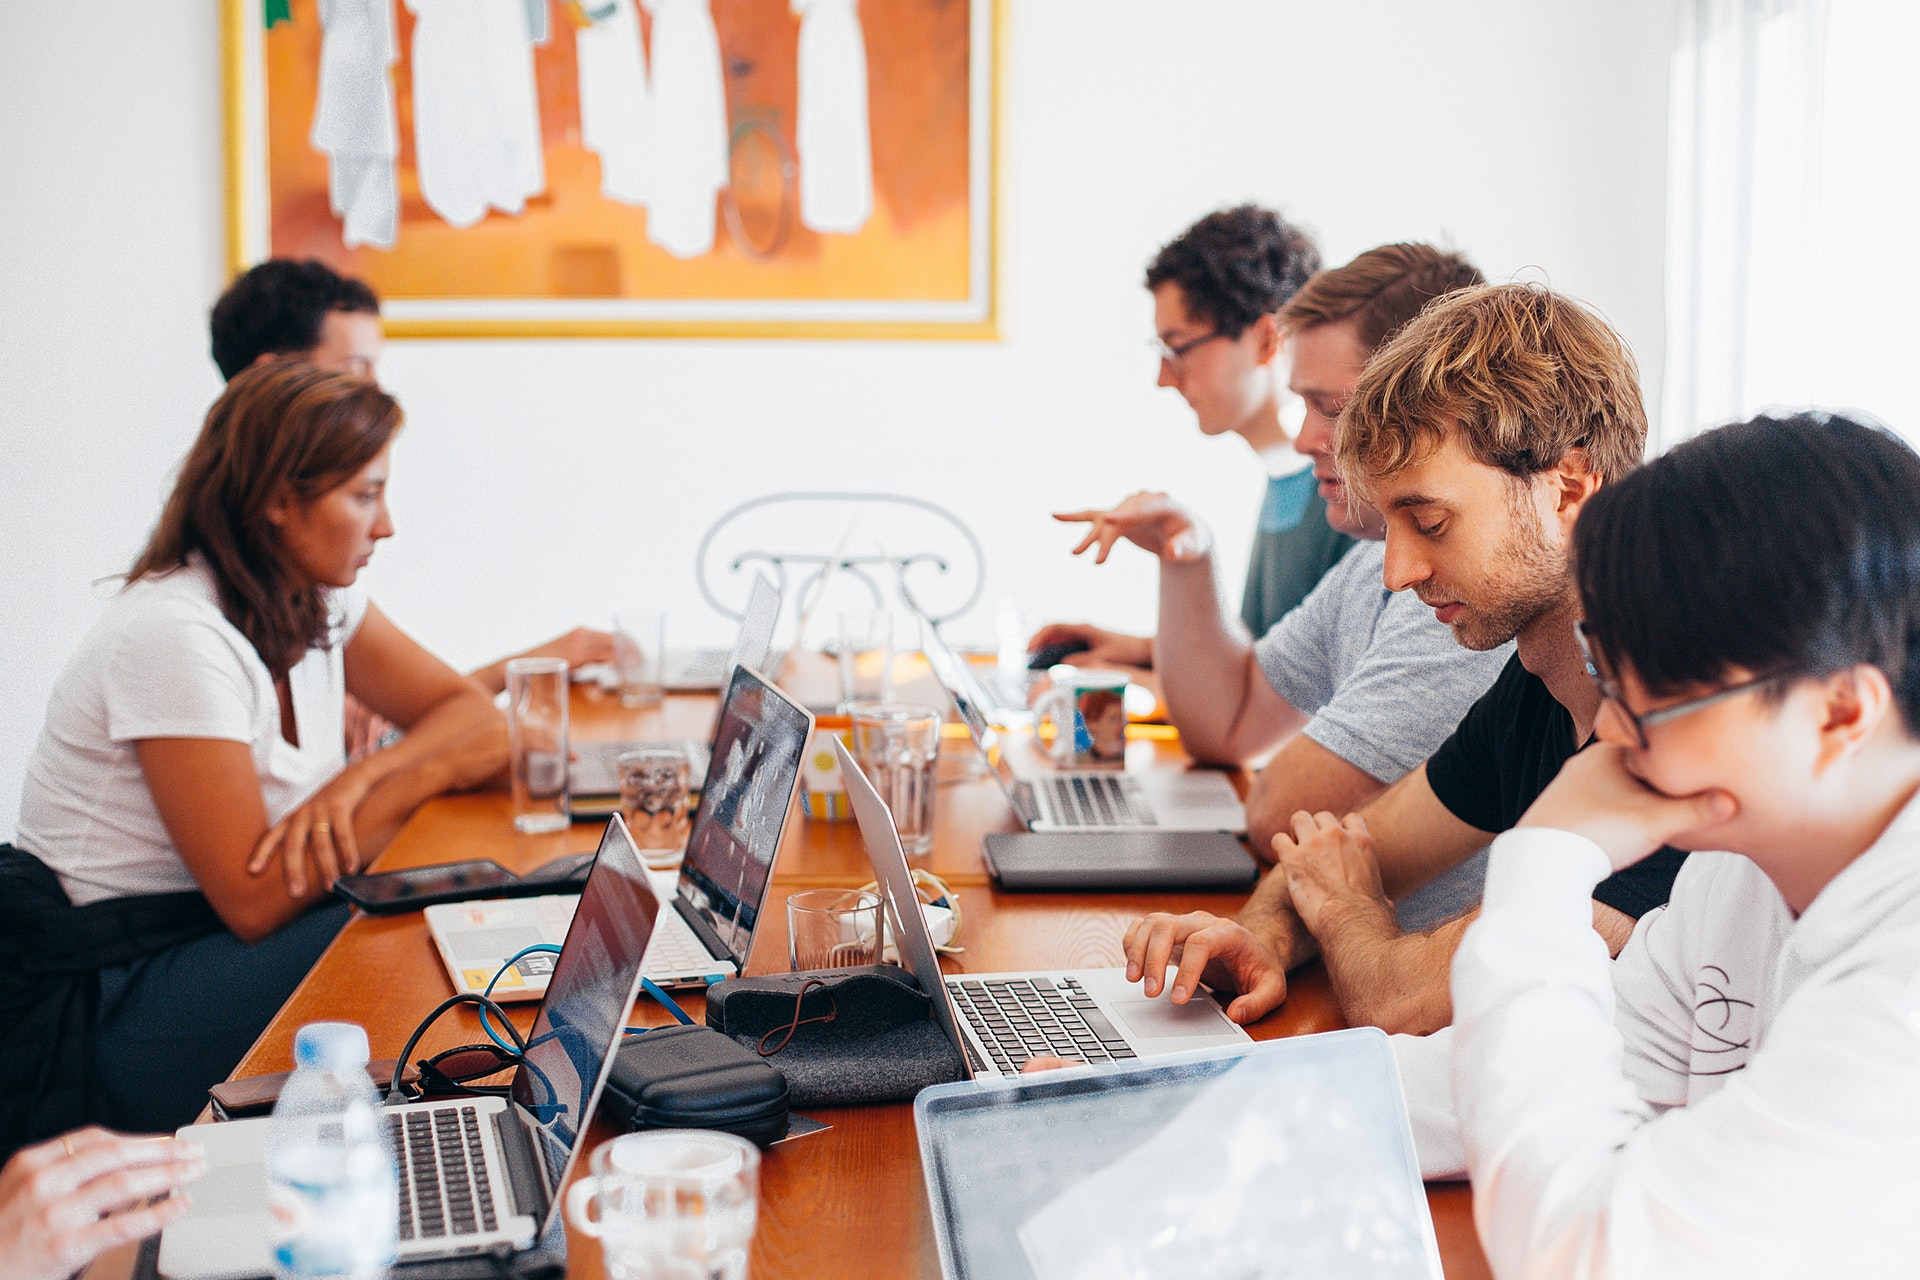 Cloudlead organizational tools